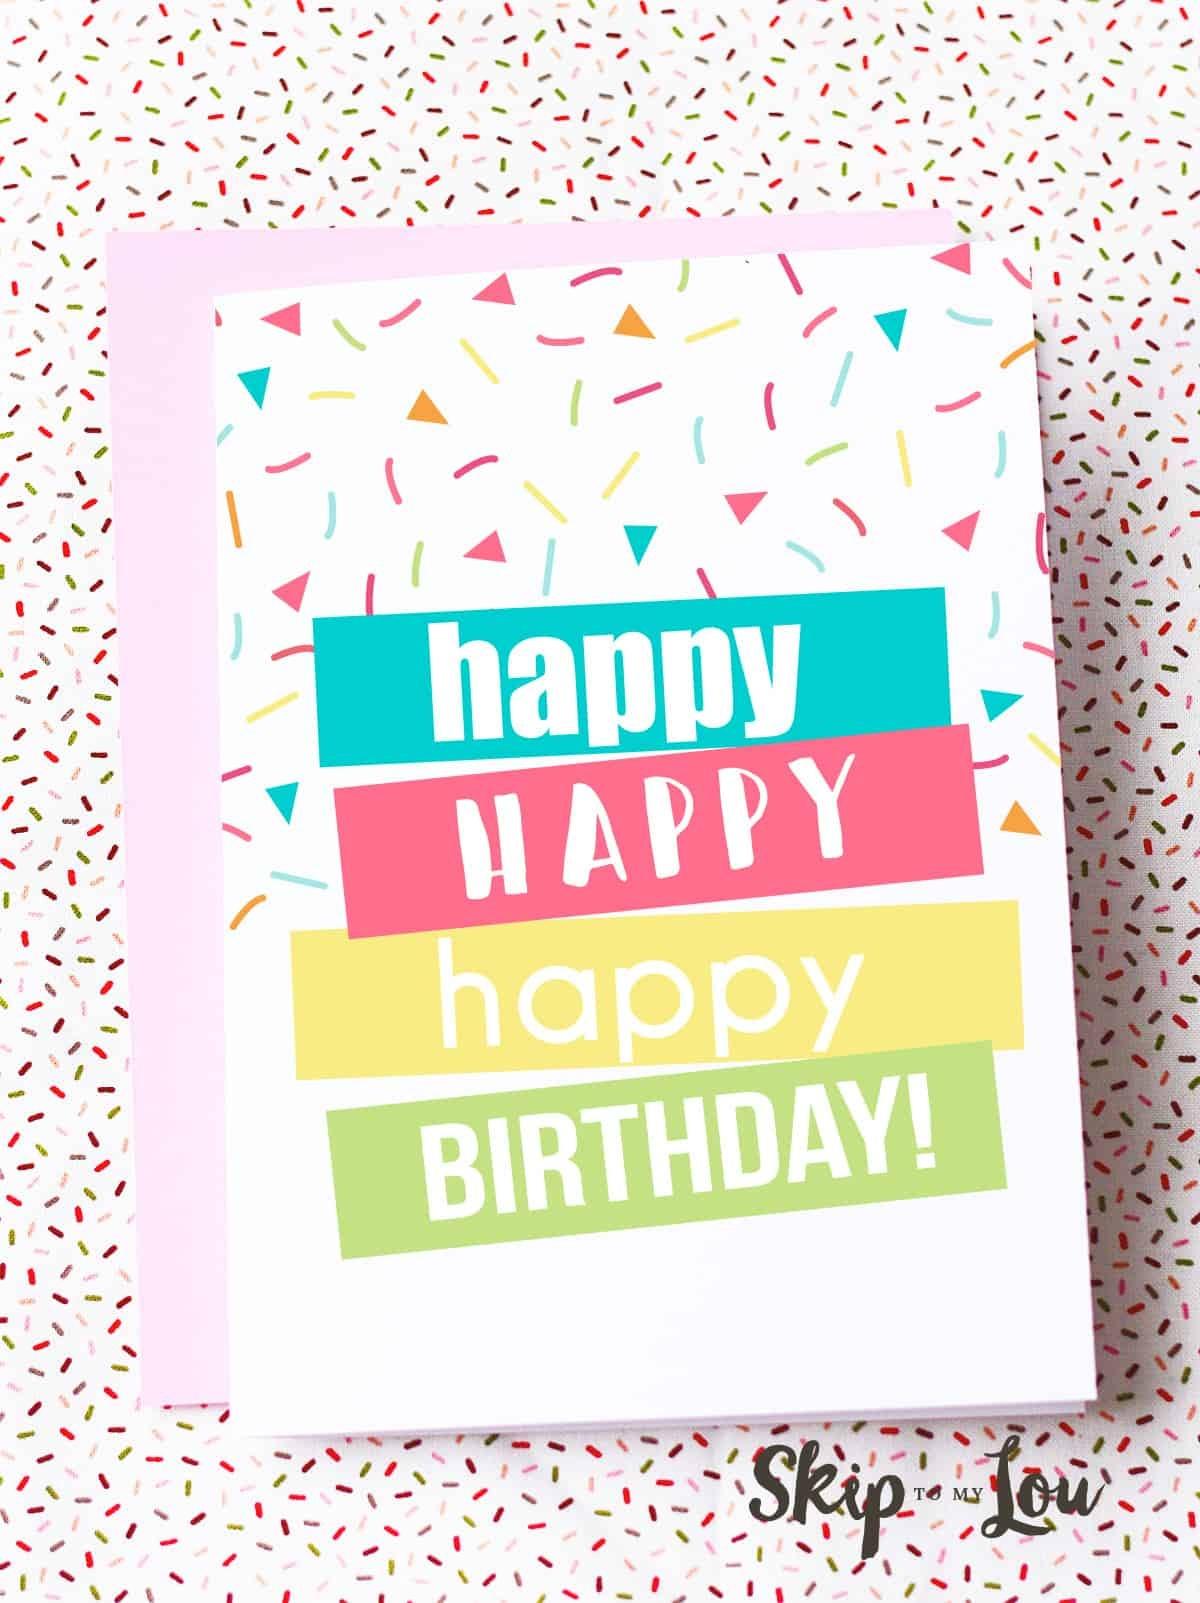 Free Printable Birthday Cards | Skip To My Lou - Free Printable Bday Cards